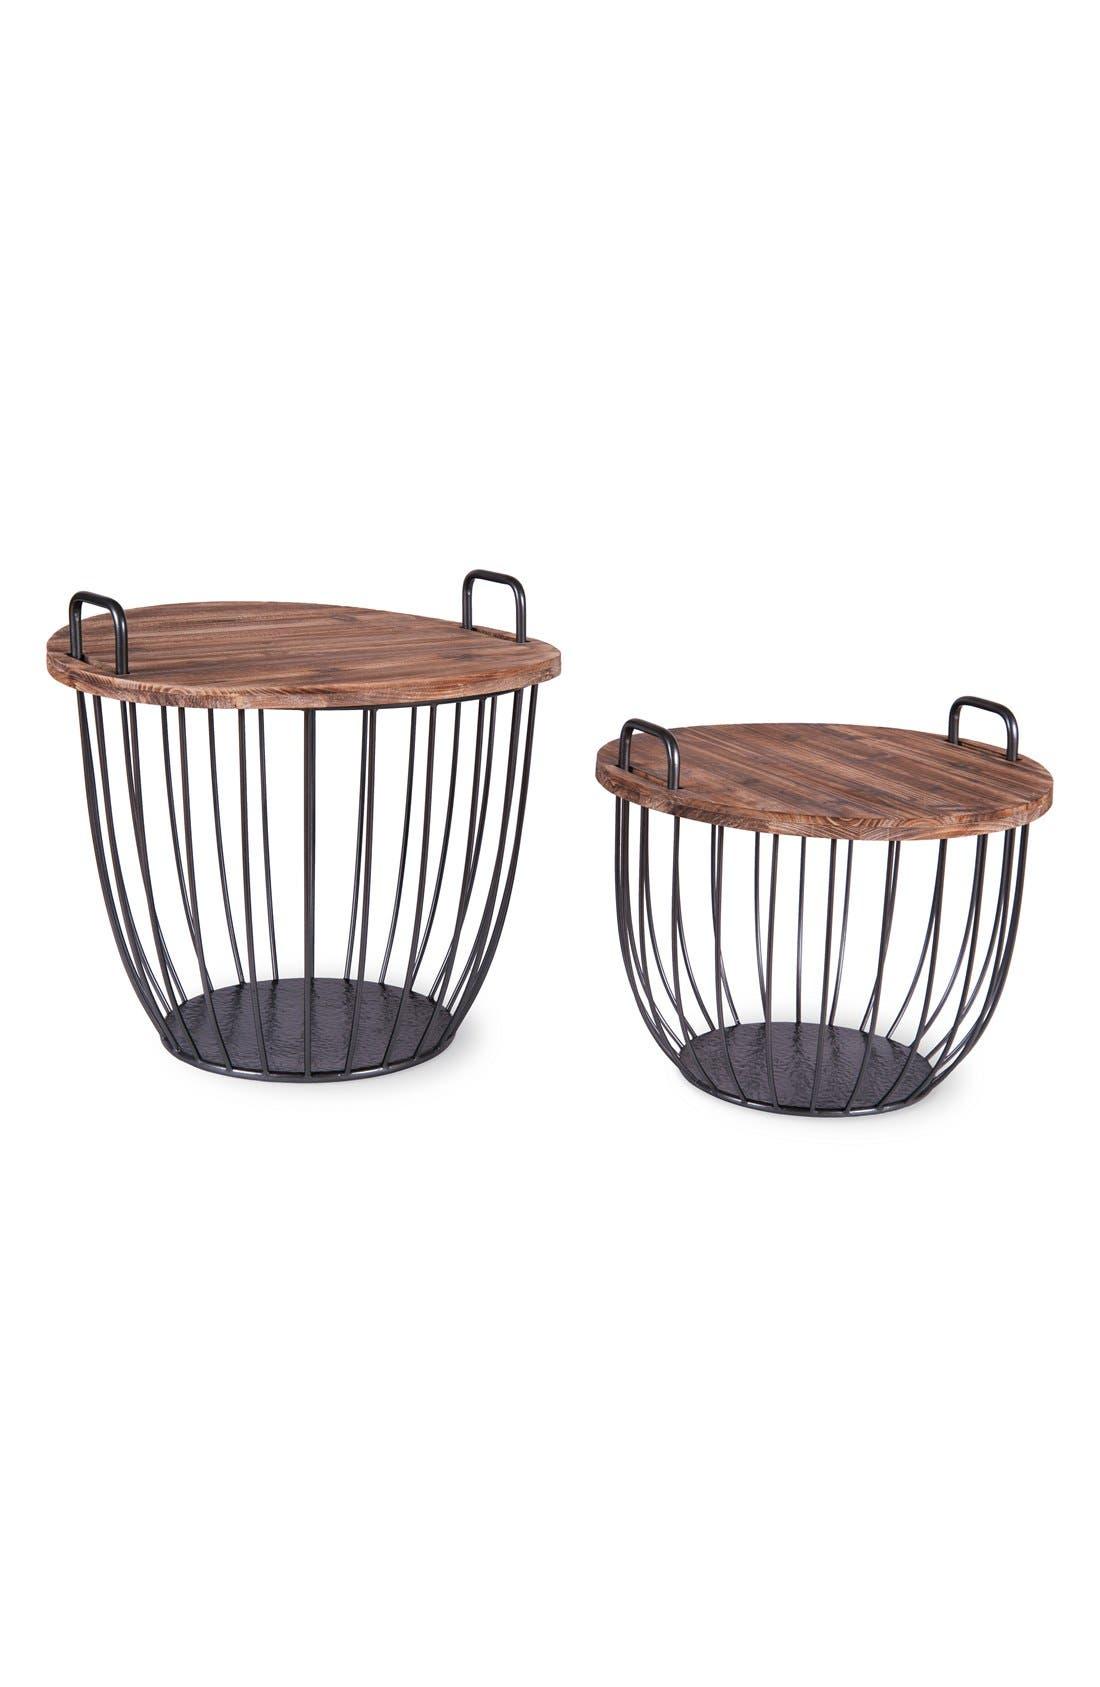 Alternate Image 1 Selected - Foreside Basket Tables (Set of 2)